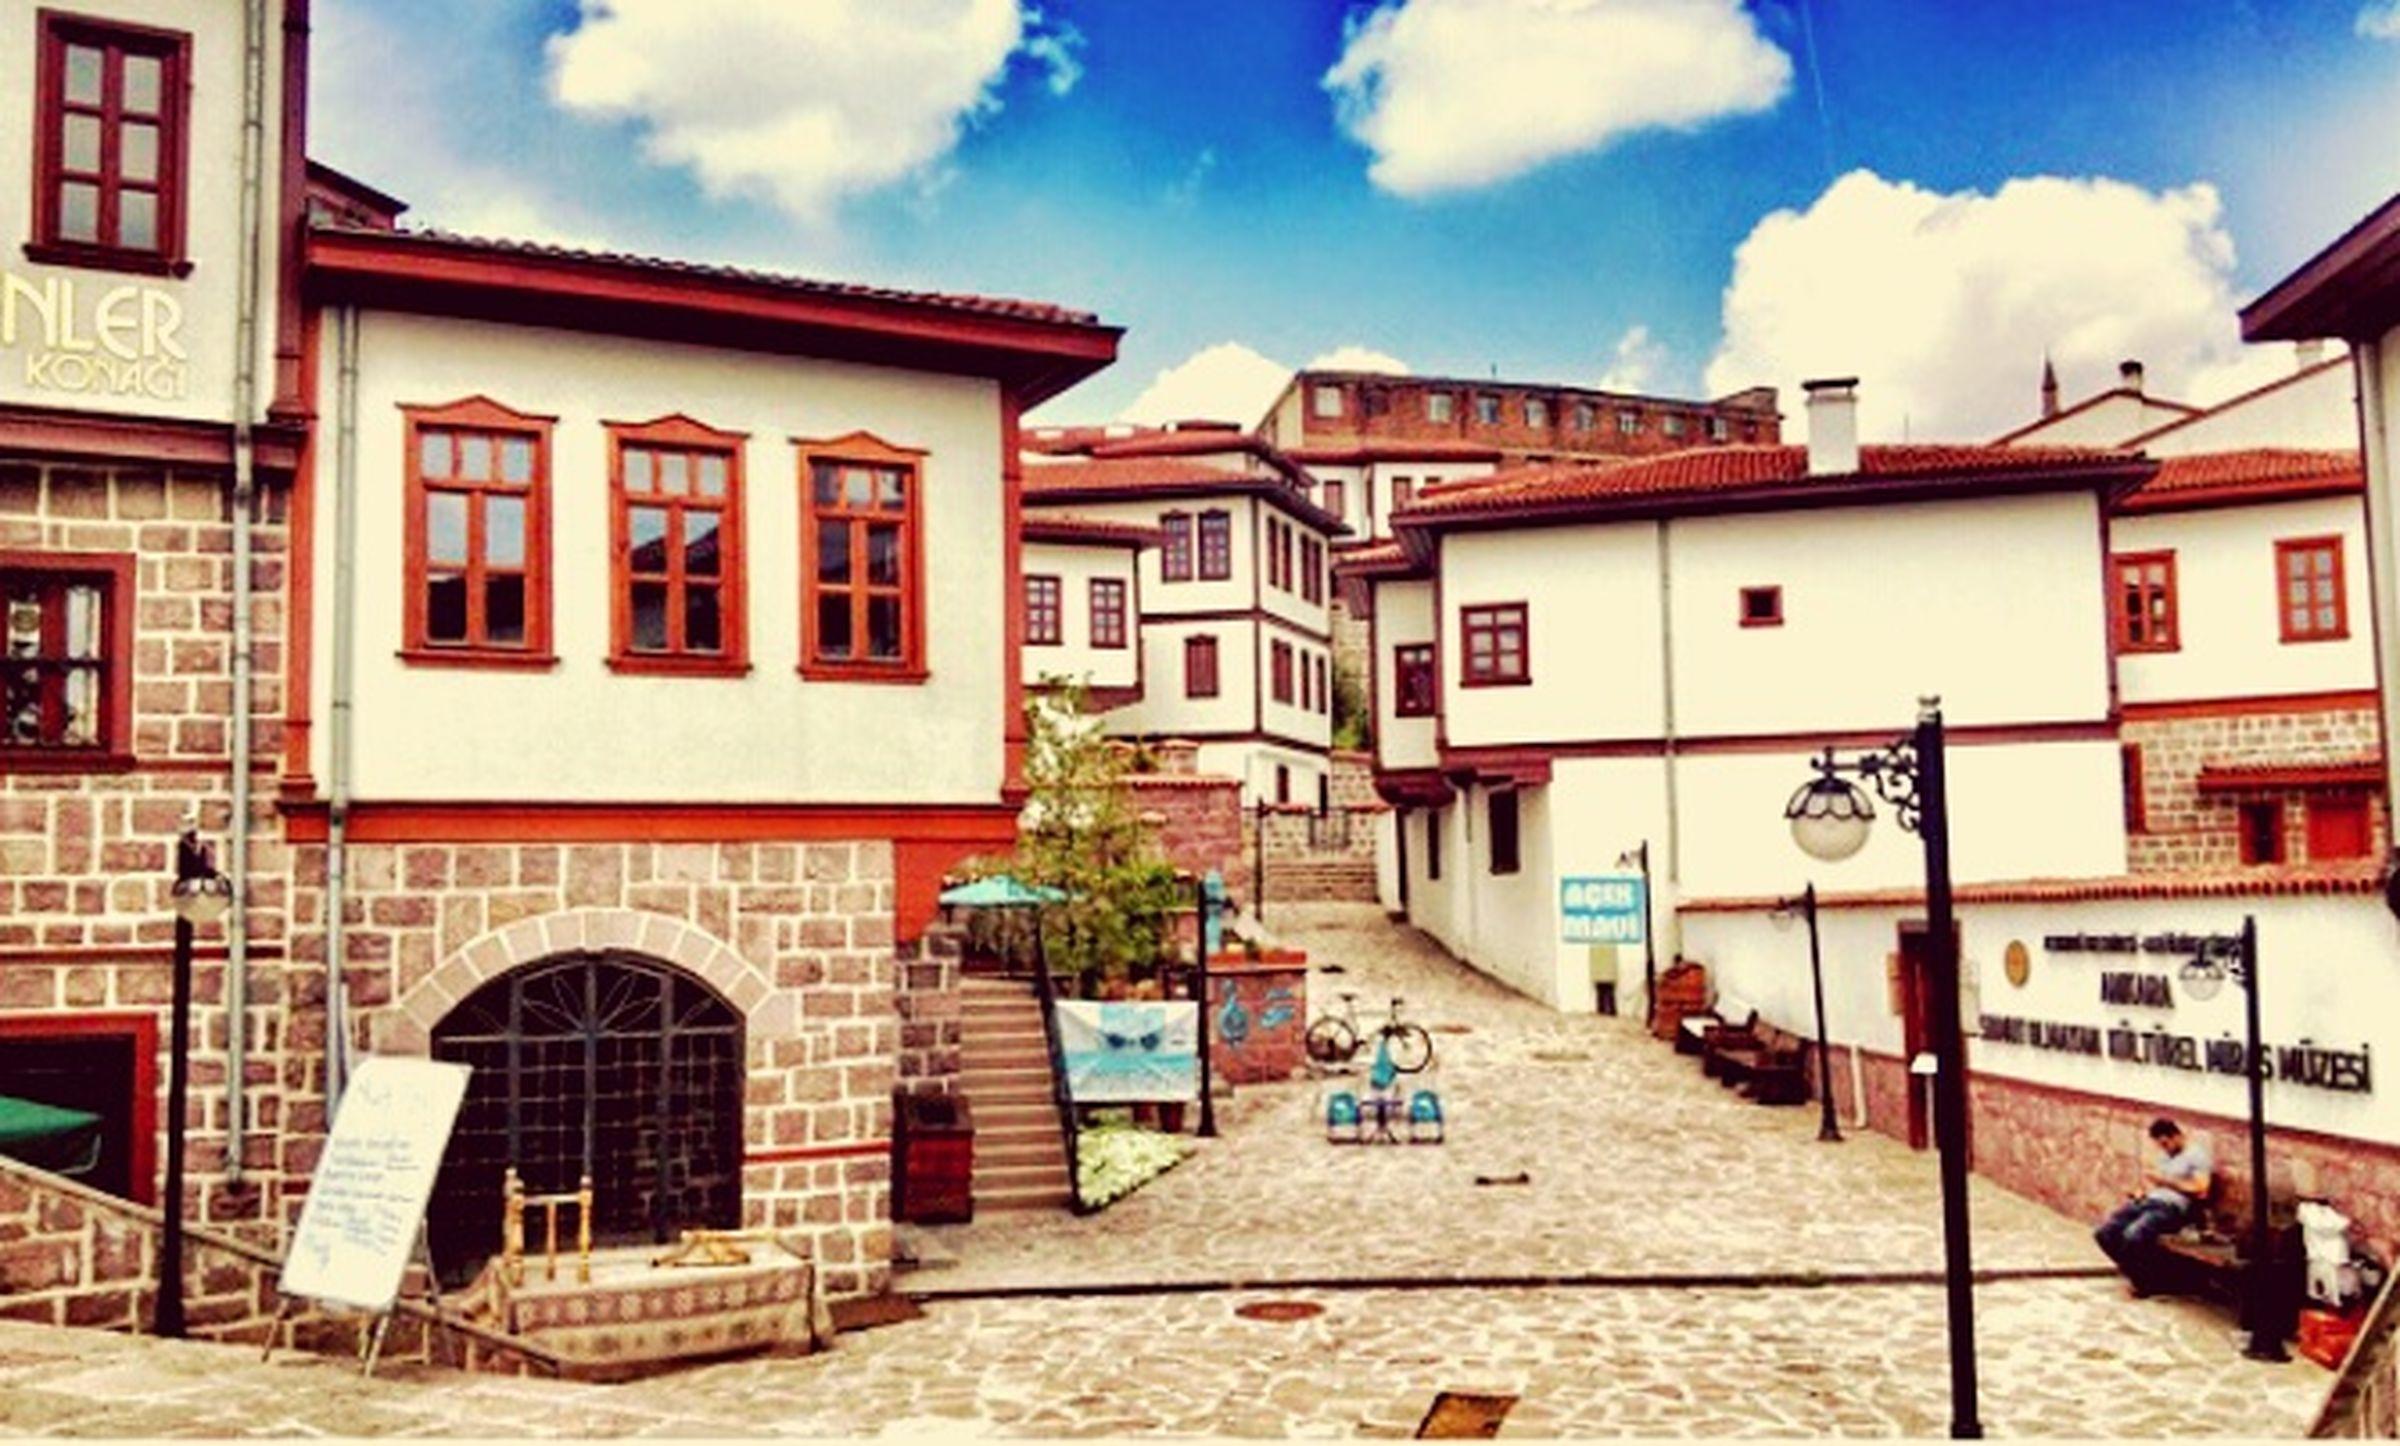 Ankarabirbaşka